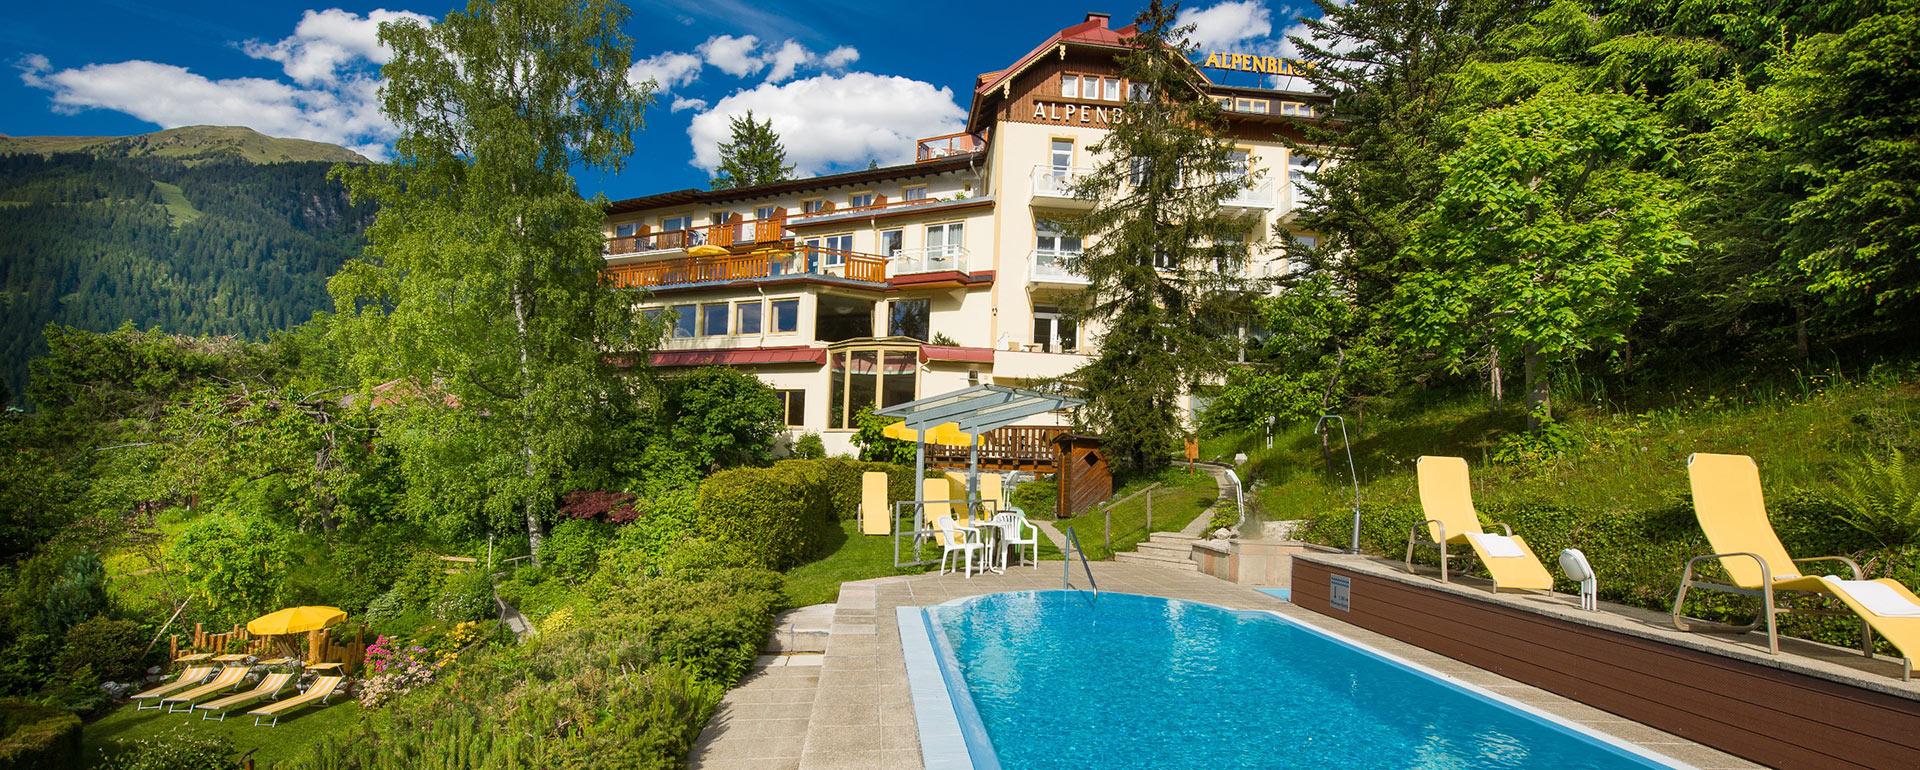 Panoramahotel Alpenblick